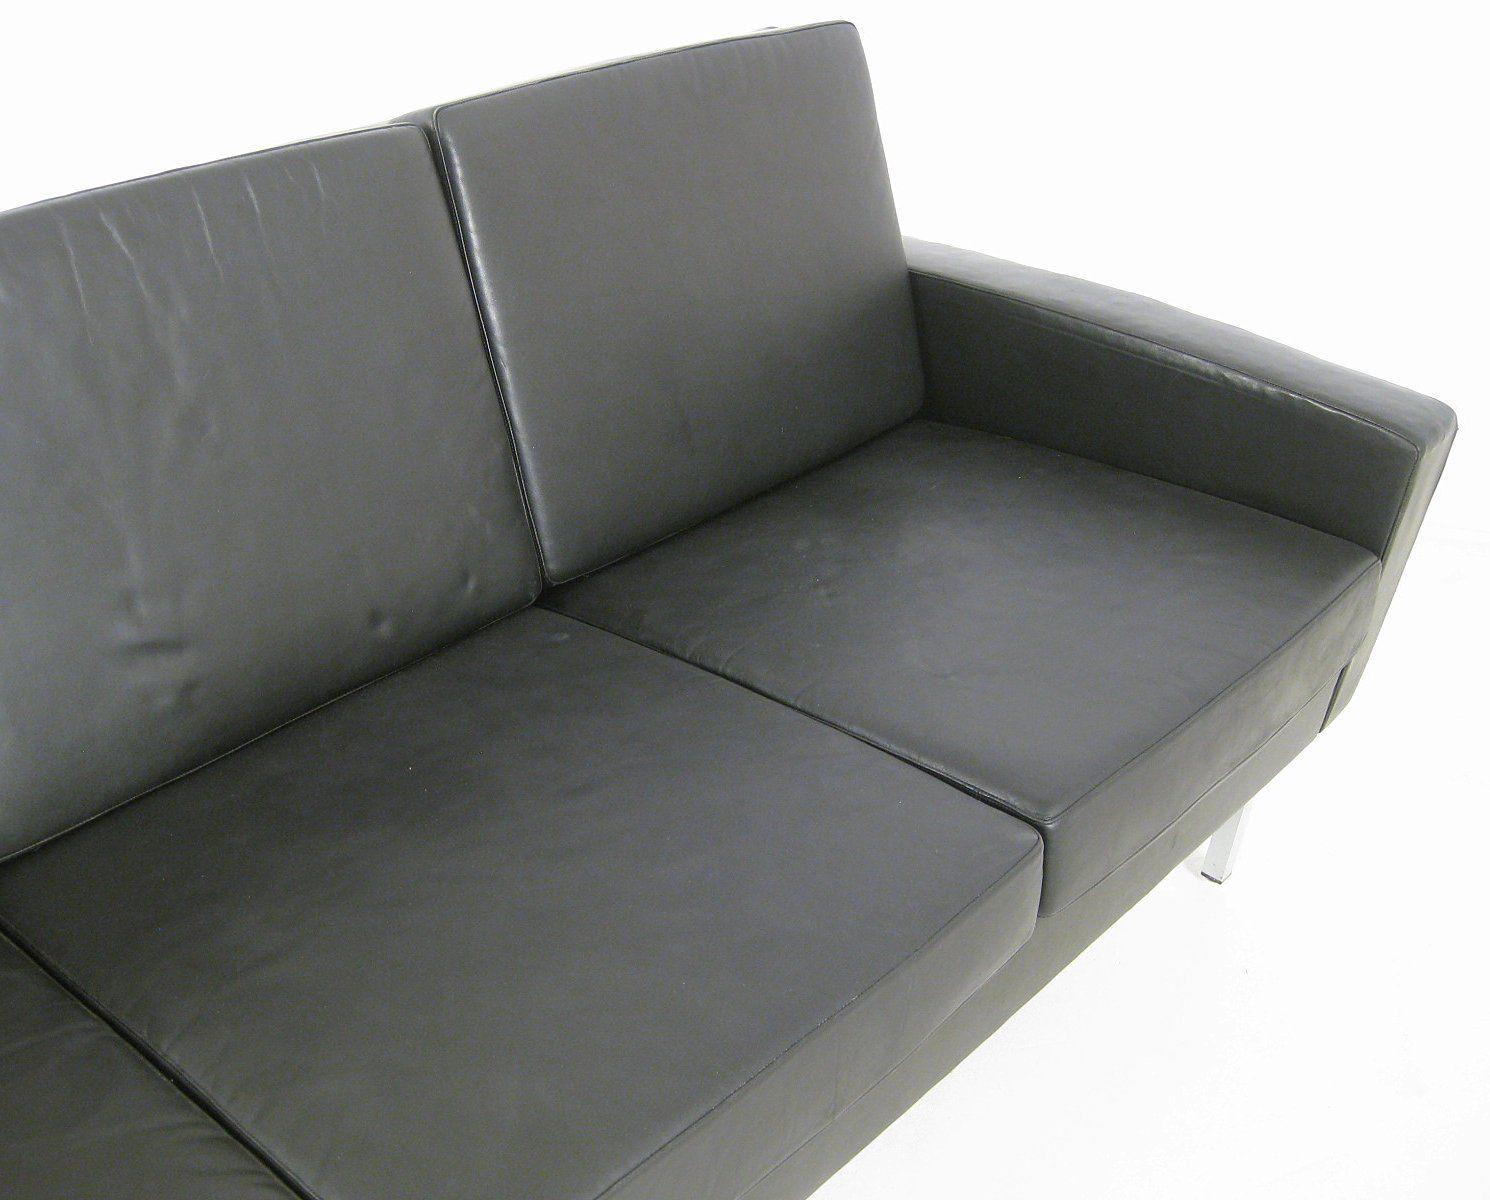 vier sitzer ledersofa 1960er bei pamono kaufen. Black Bedroom Furniture Sets. Home Design Ideas